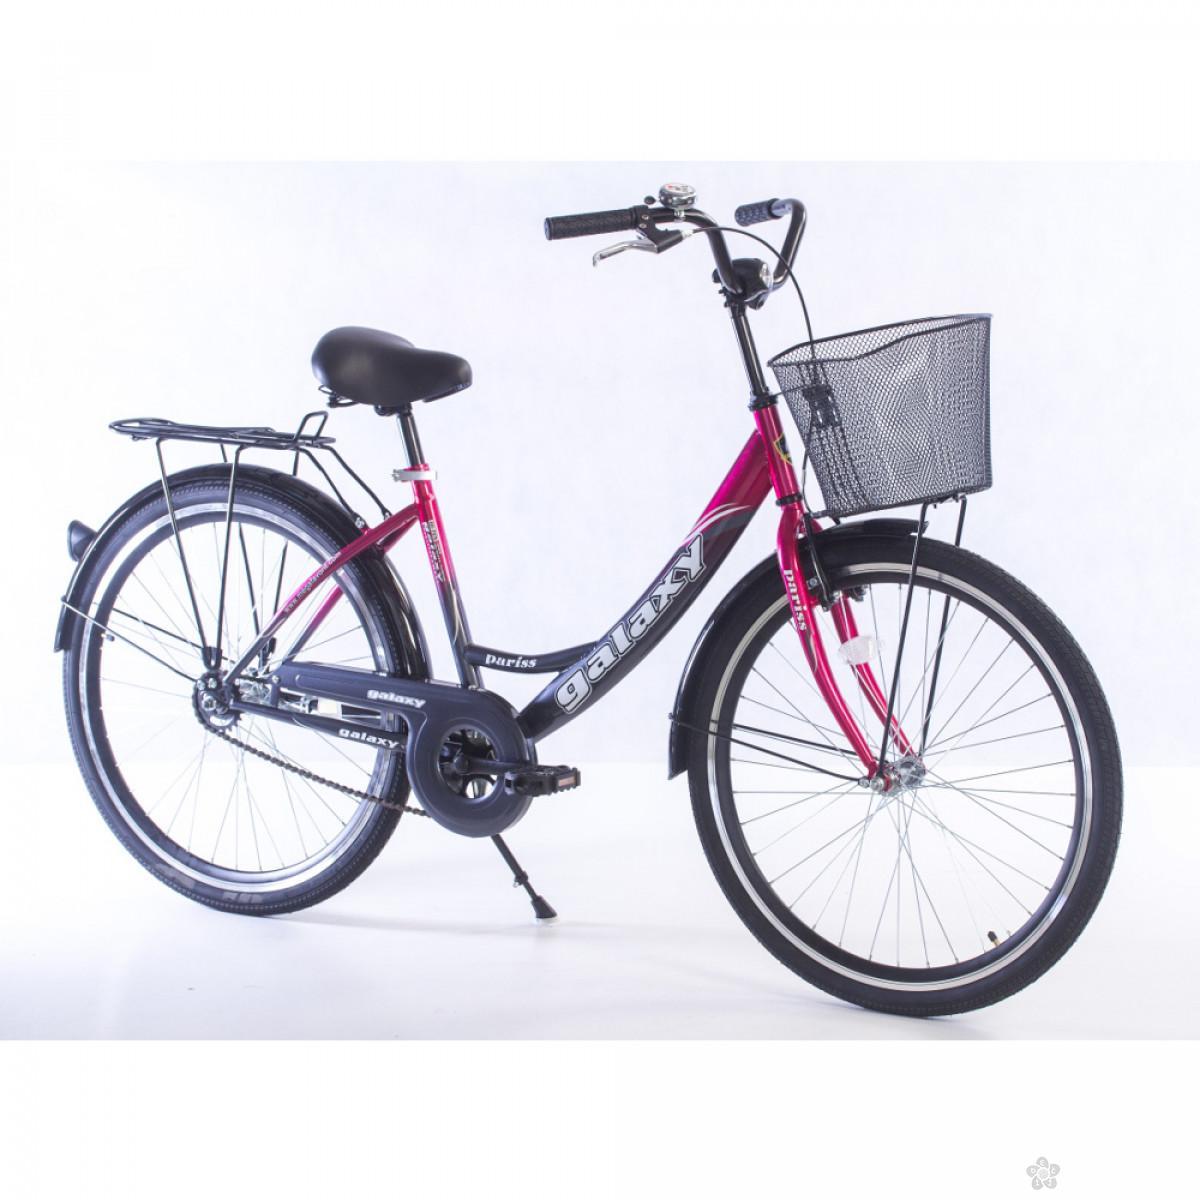 Bicikl Paris 26 siva/ciklama, 650085